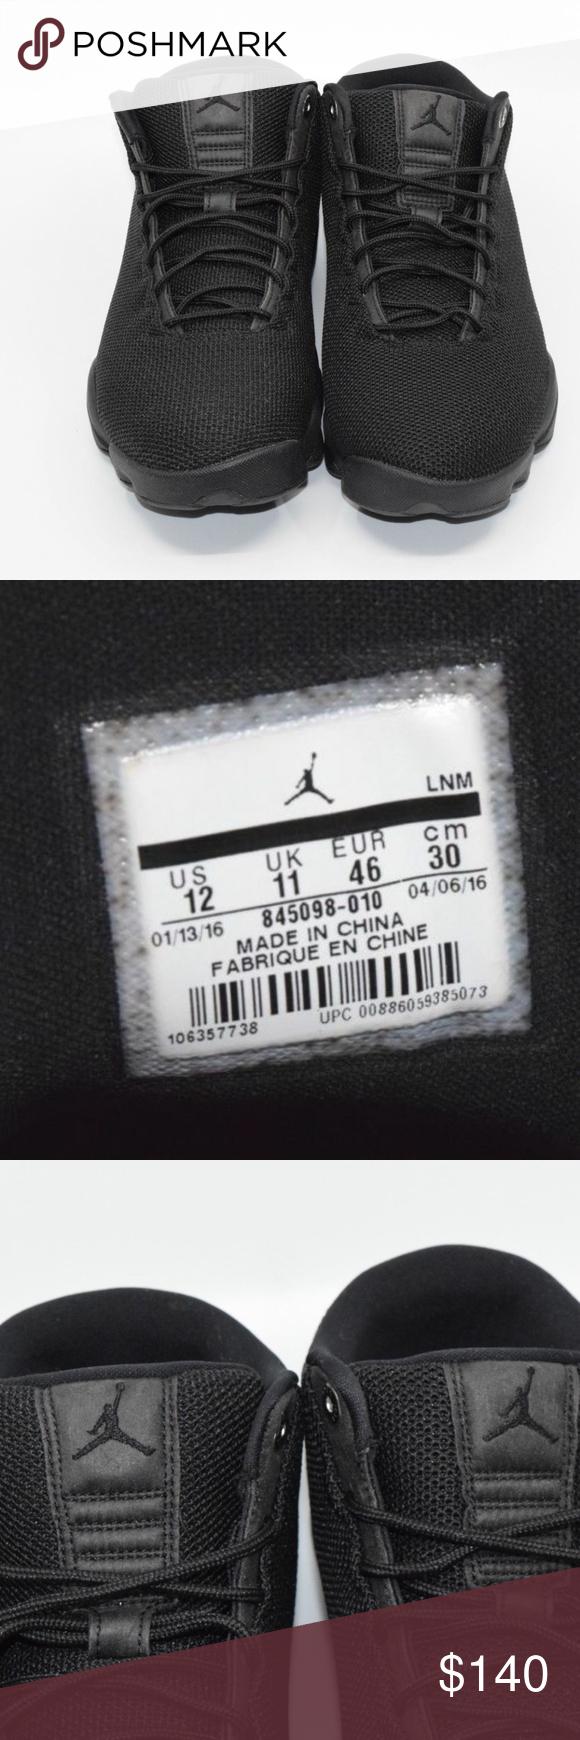 4d9e90d3a99a Nike Air Jordan Horizon Low Triple Black Limited Nike Air Jordan Horizon  Low Triple Black Limited Retro Size 12 Mens 845098-010 New without Box Jordan  Shoes ...